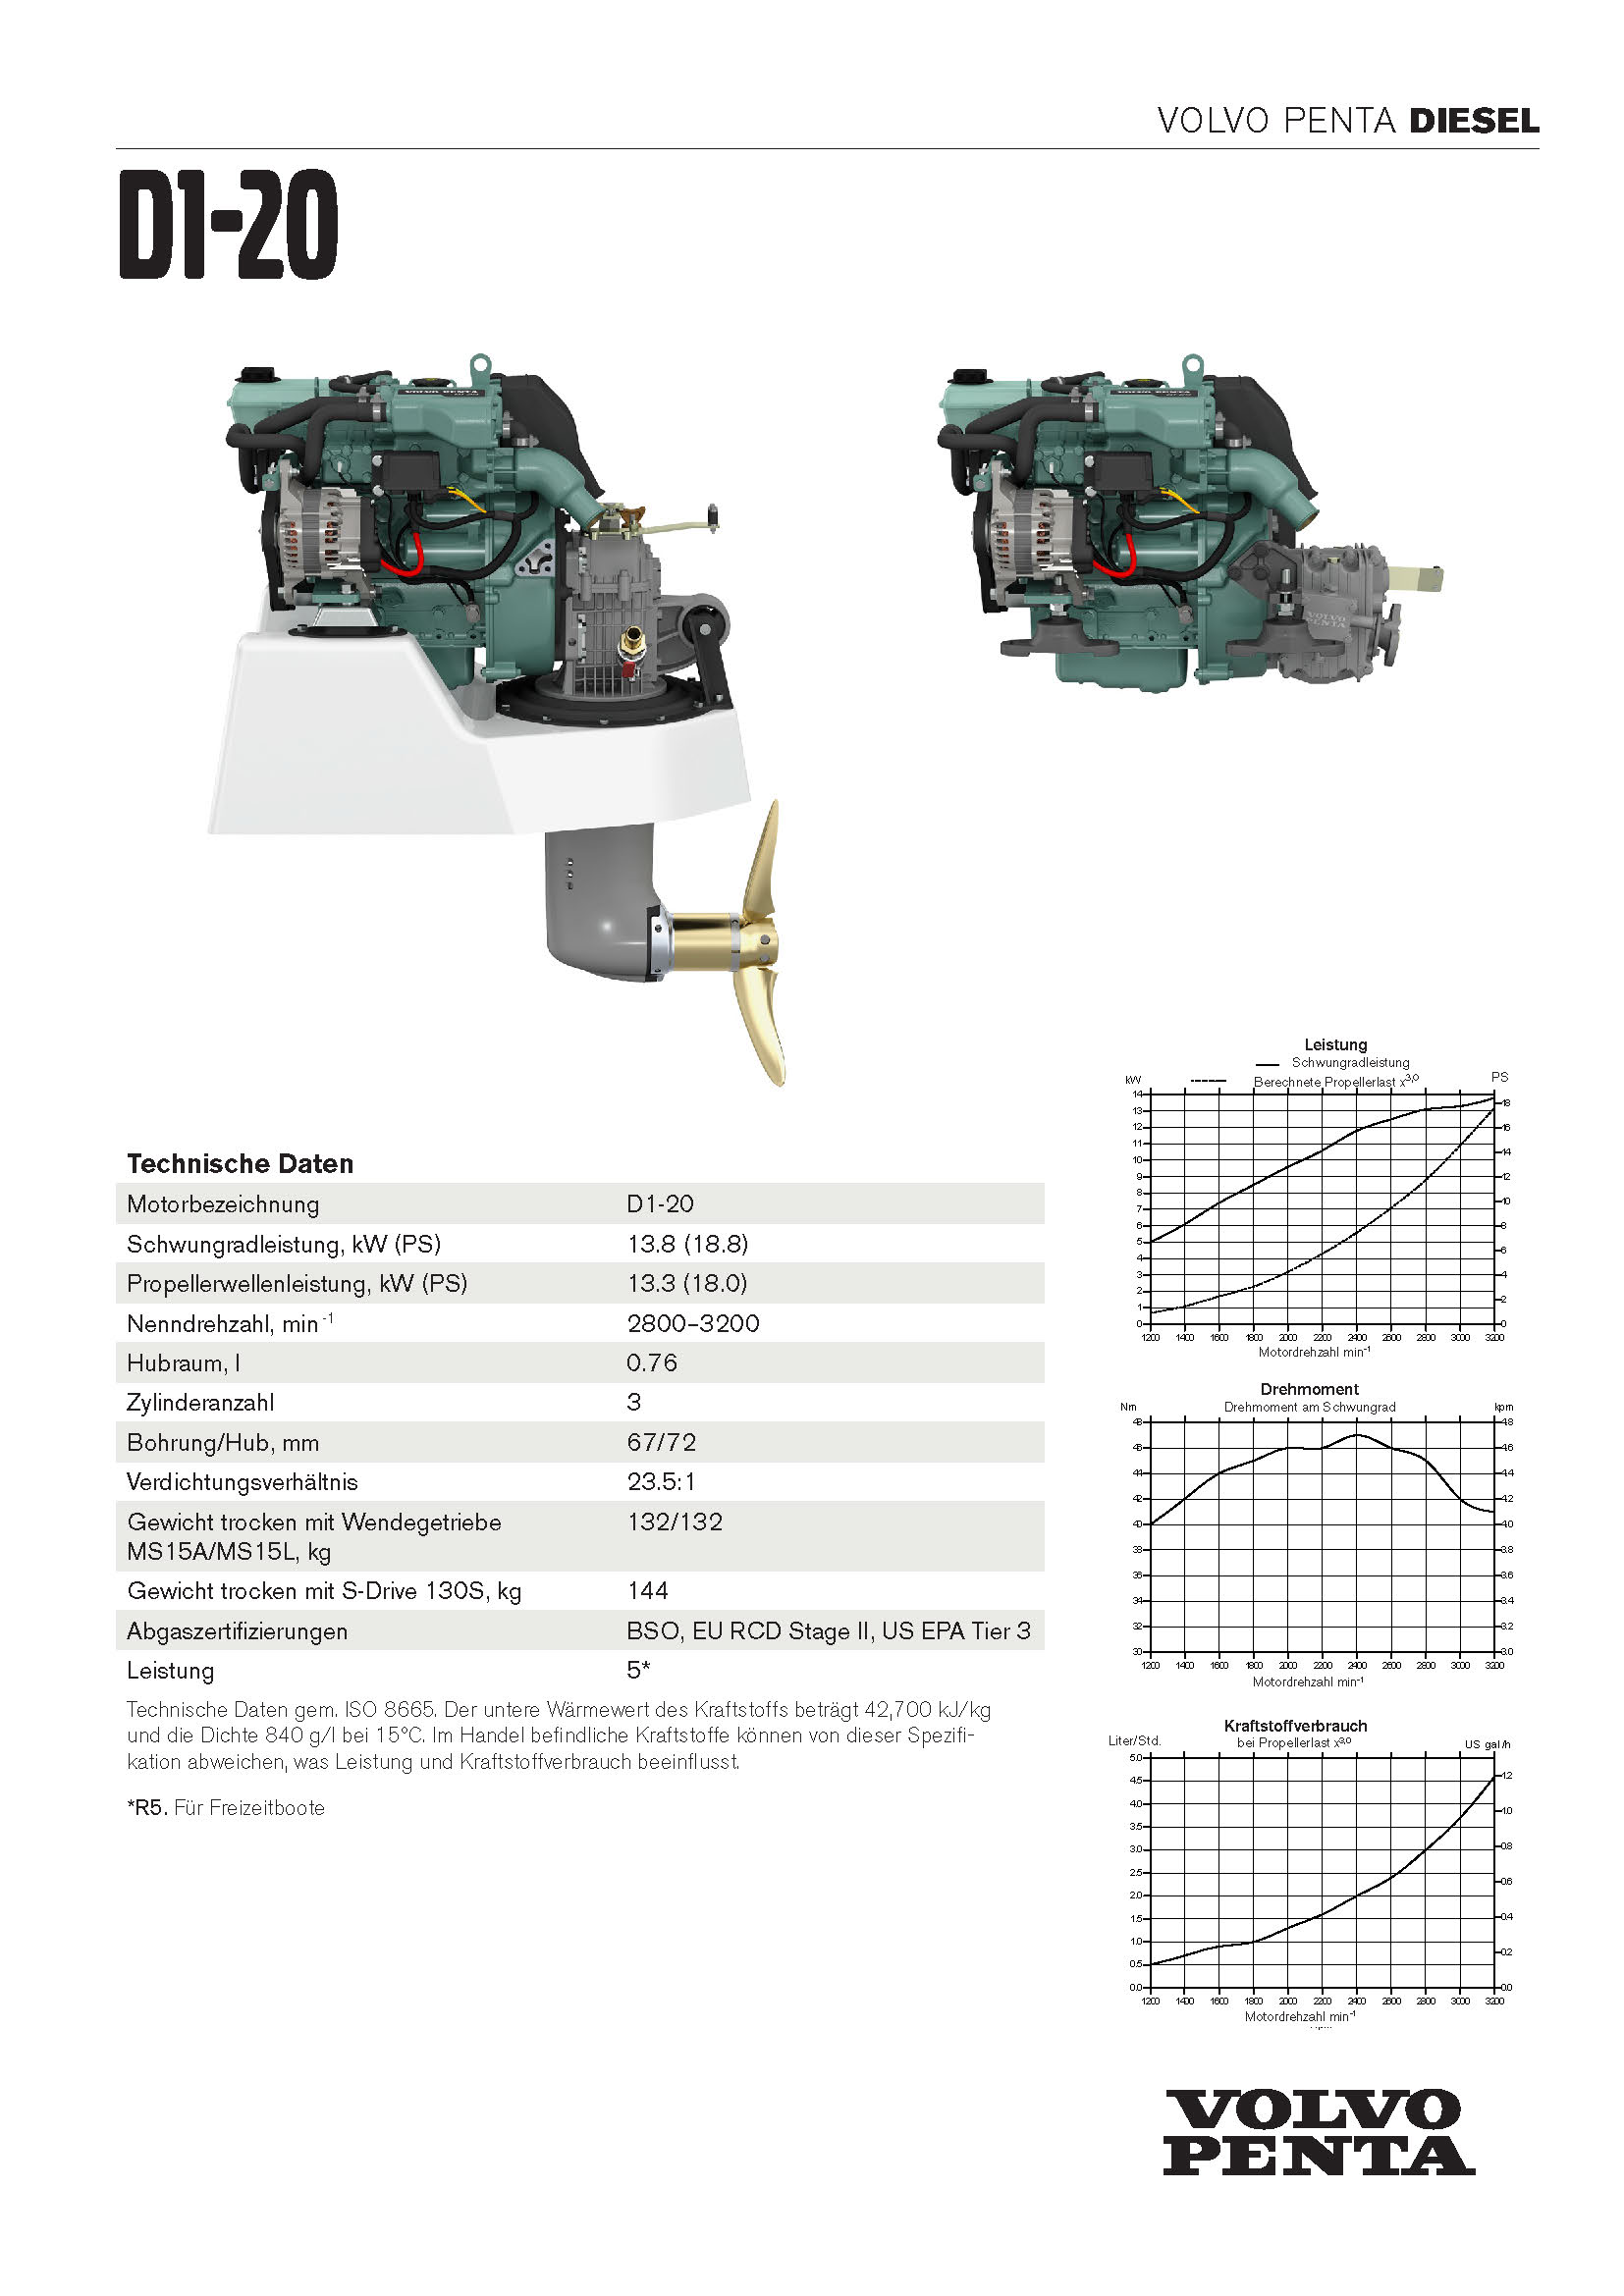 Volvo Penta D1-20 Bootsmotor